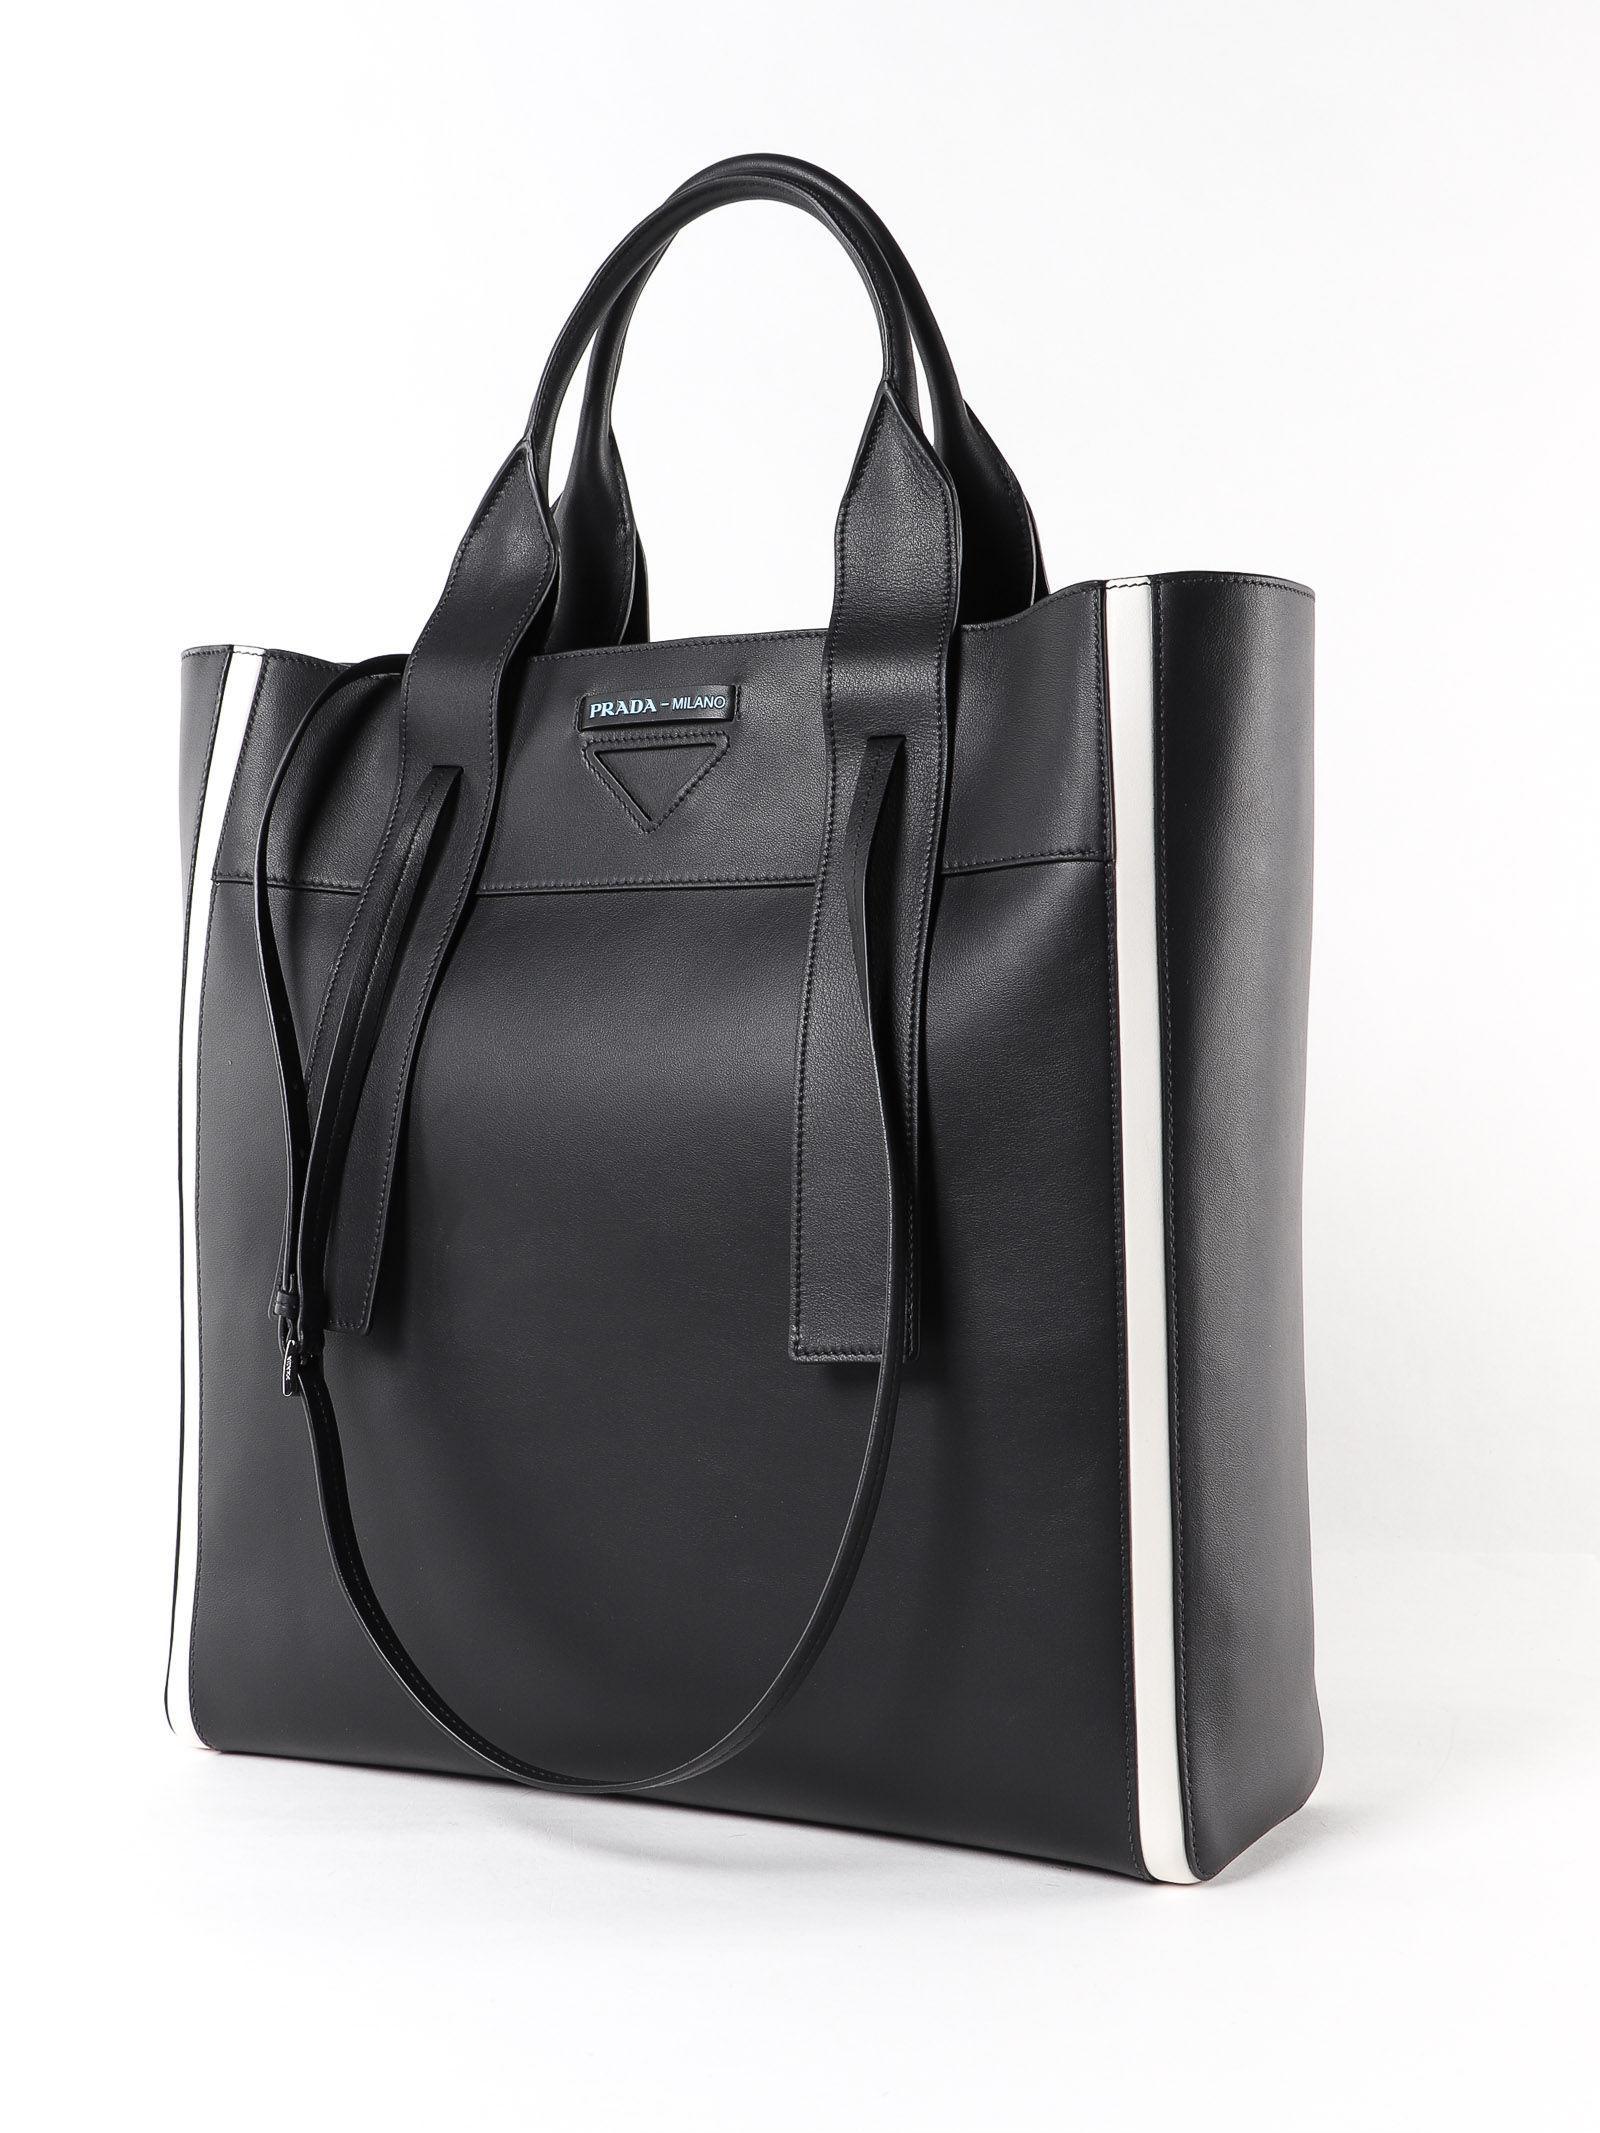 82ee1609f9 Prada Handbag Grace Lux in Black - Lyst